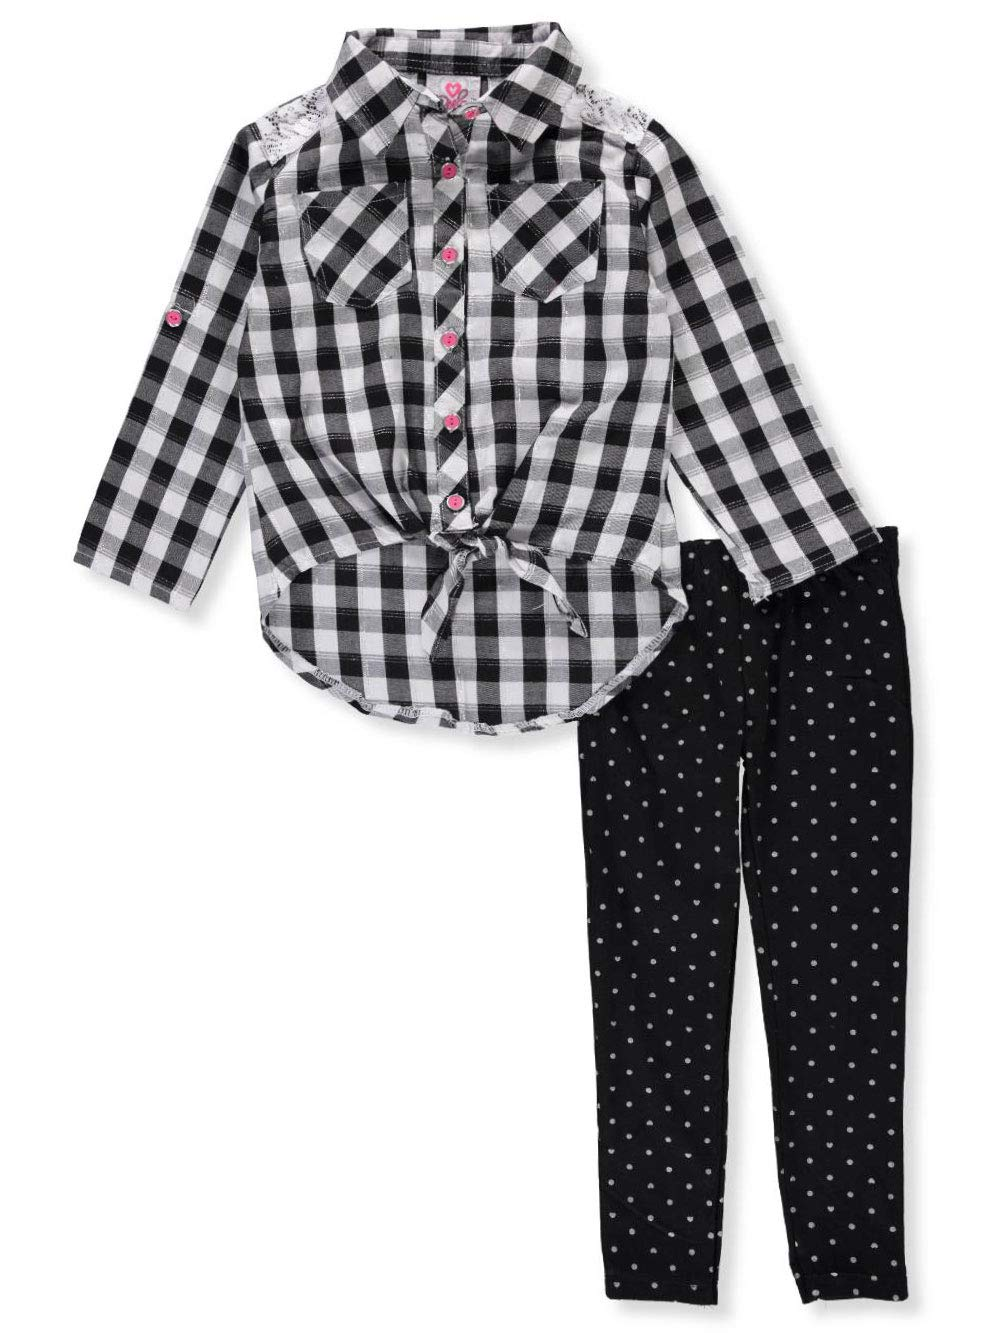 Real Love Little Girls' 2-Piece Leggings Set Outfit - Black/Multi, 6X